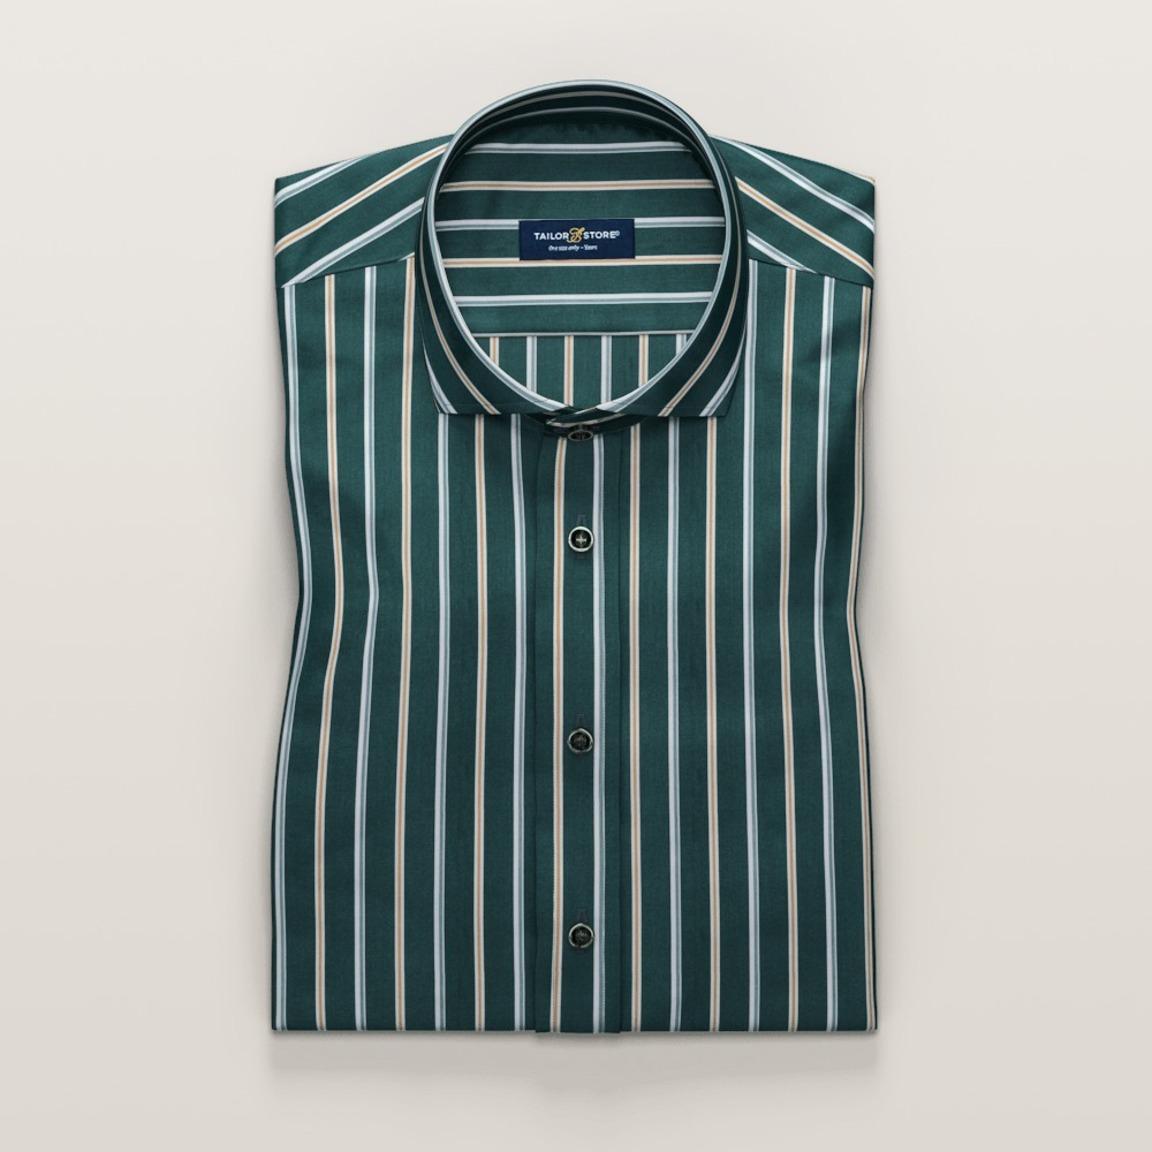 Grönrandig kortärmad businesskjorta